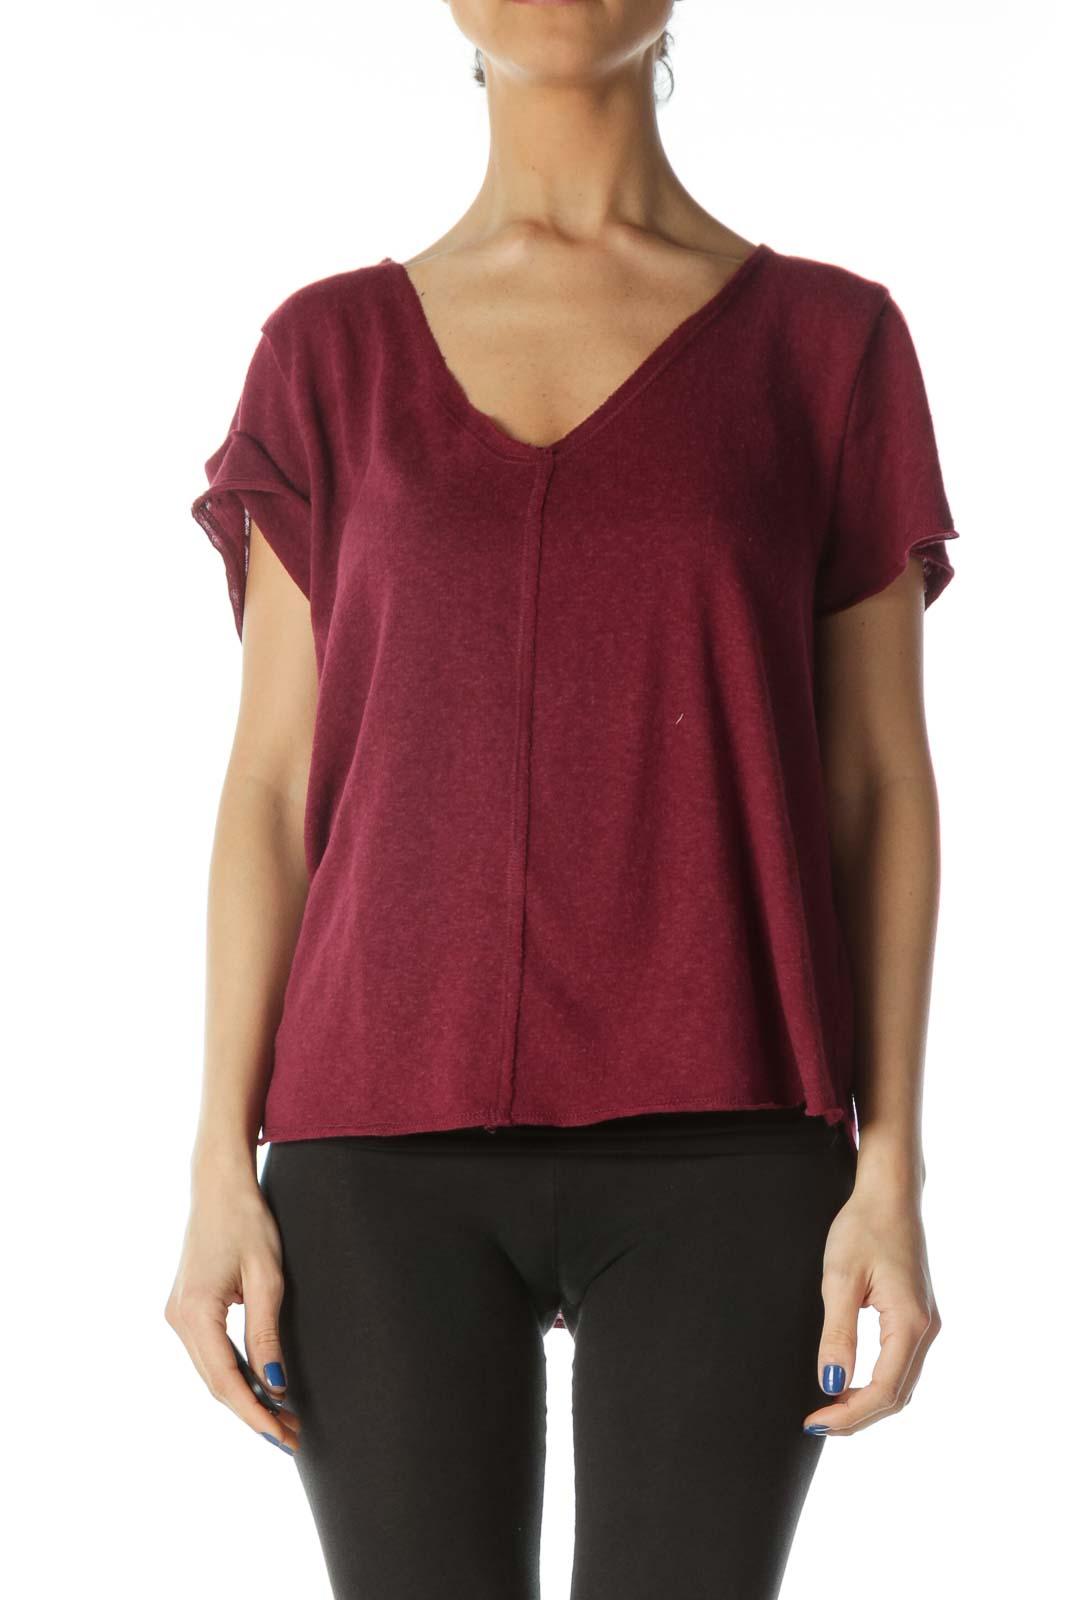 Burgundy Short Sleeve Knit Shirt   Front